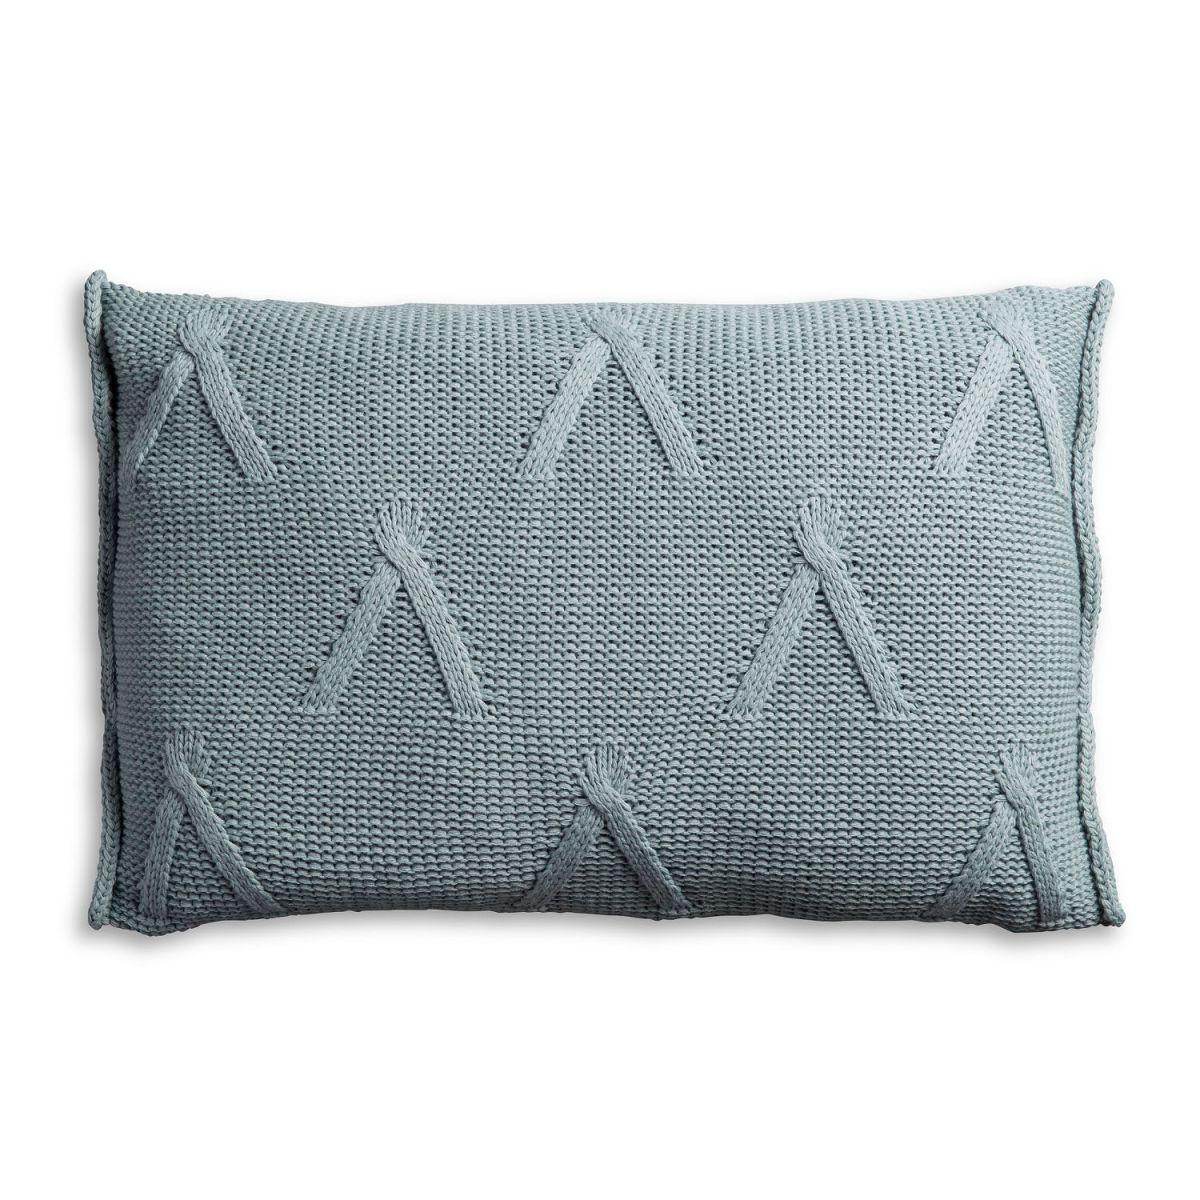 knit factory 1101309 kussen 60x40 aran stone green 2